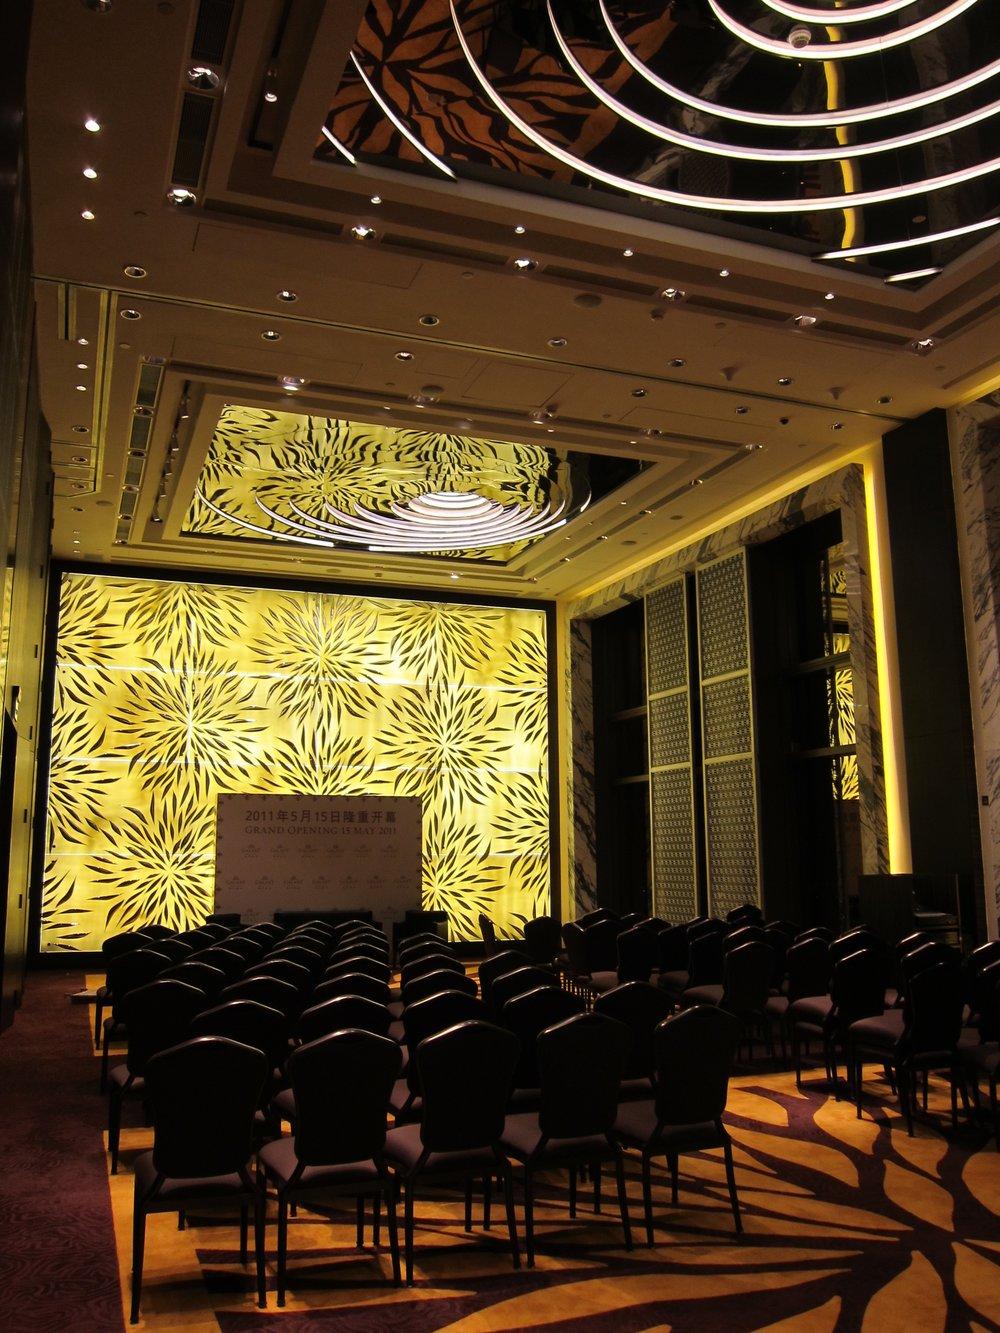 MEETING ROOM, HOTEL OKURA, MACAU